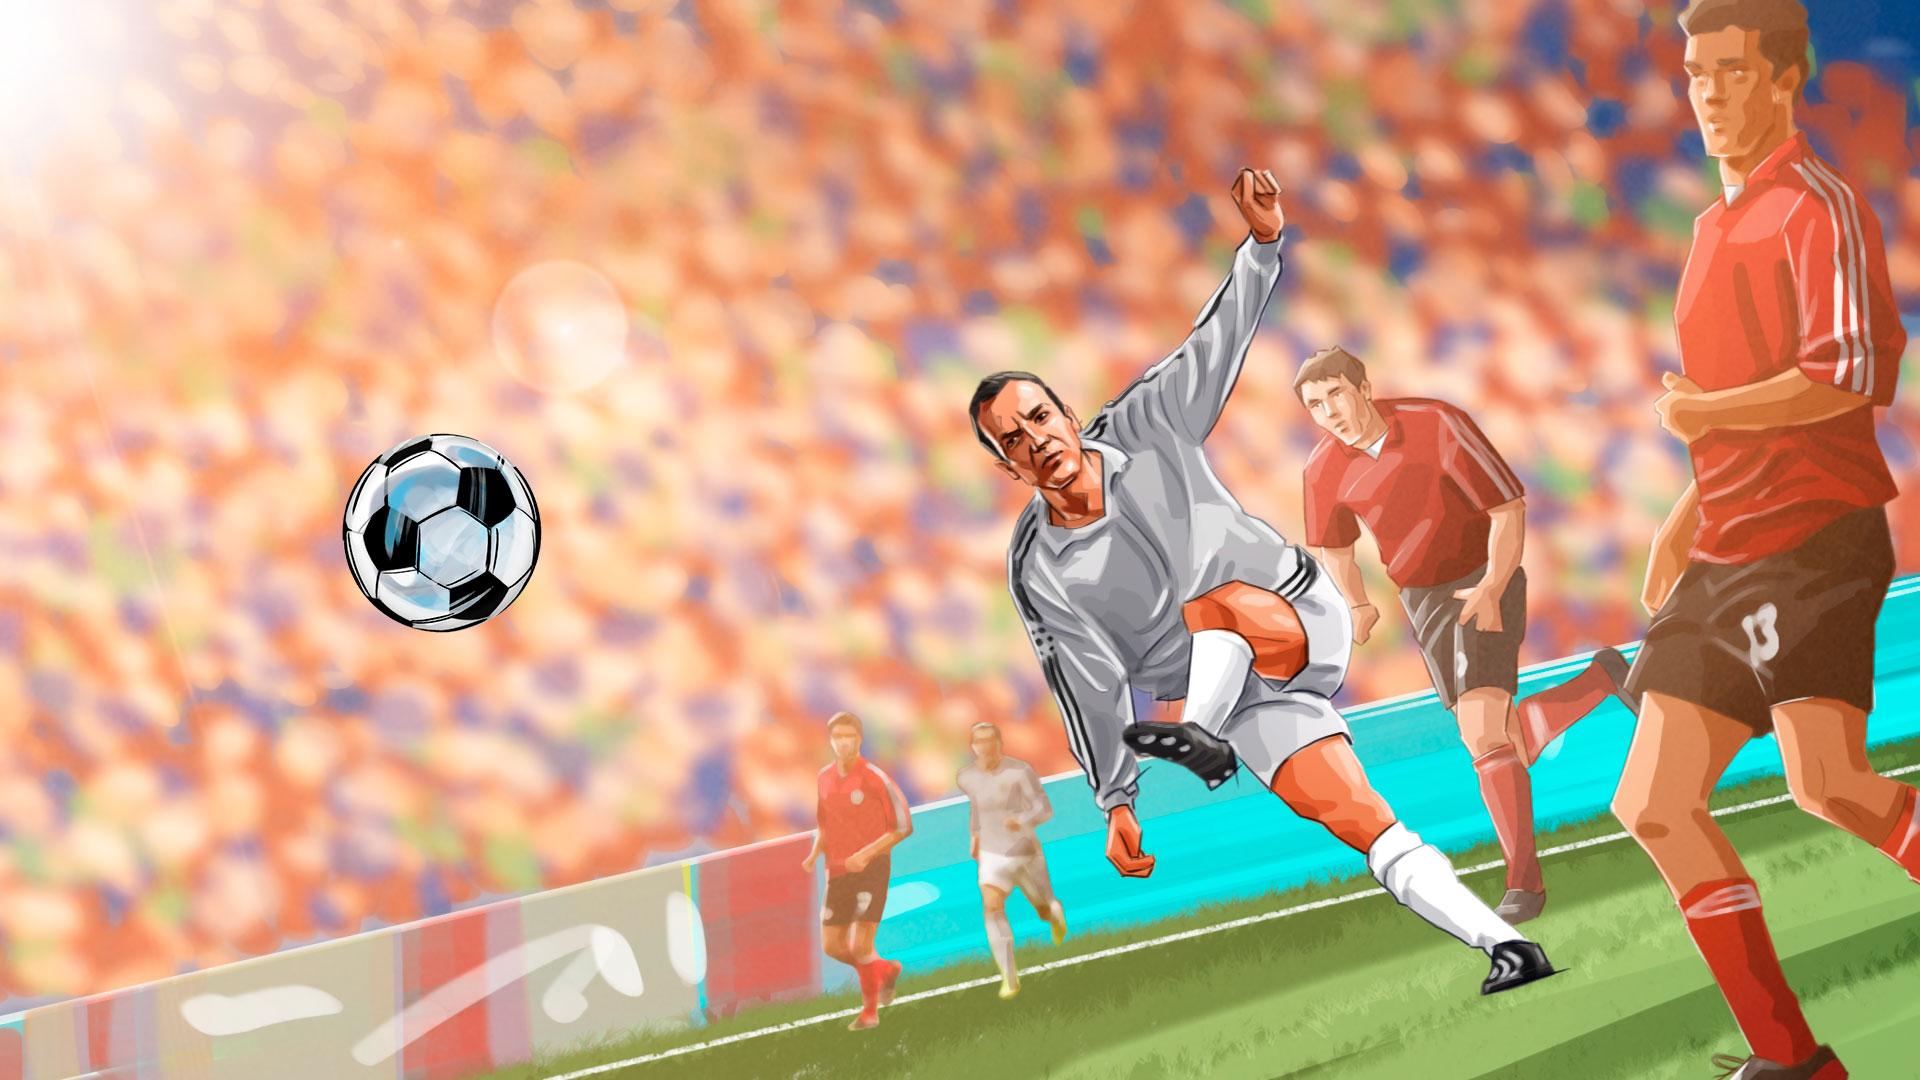 soccer kick master illustration, 'Famous matches - illustrations for web game